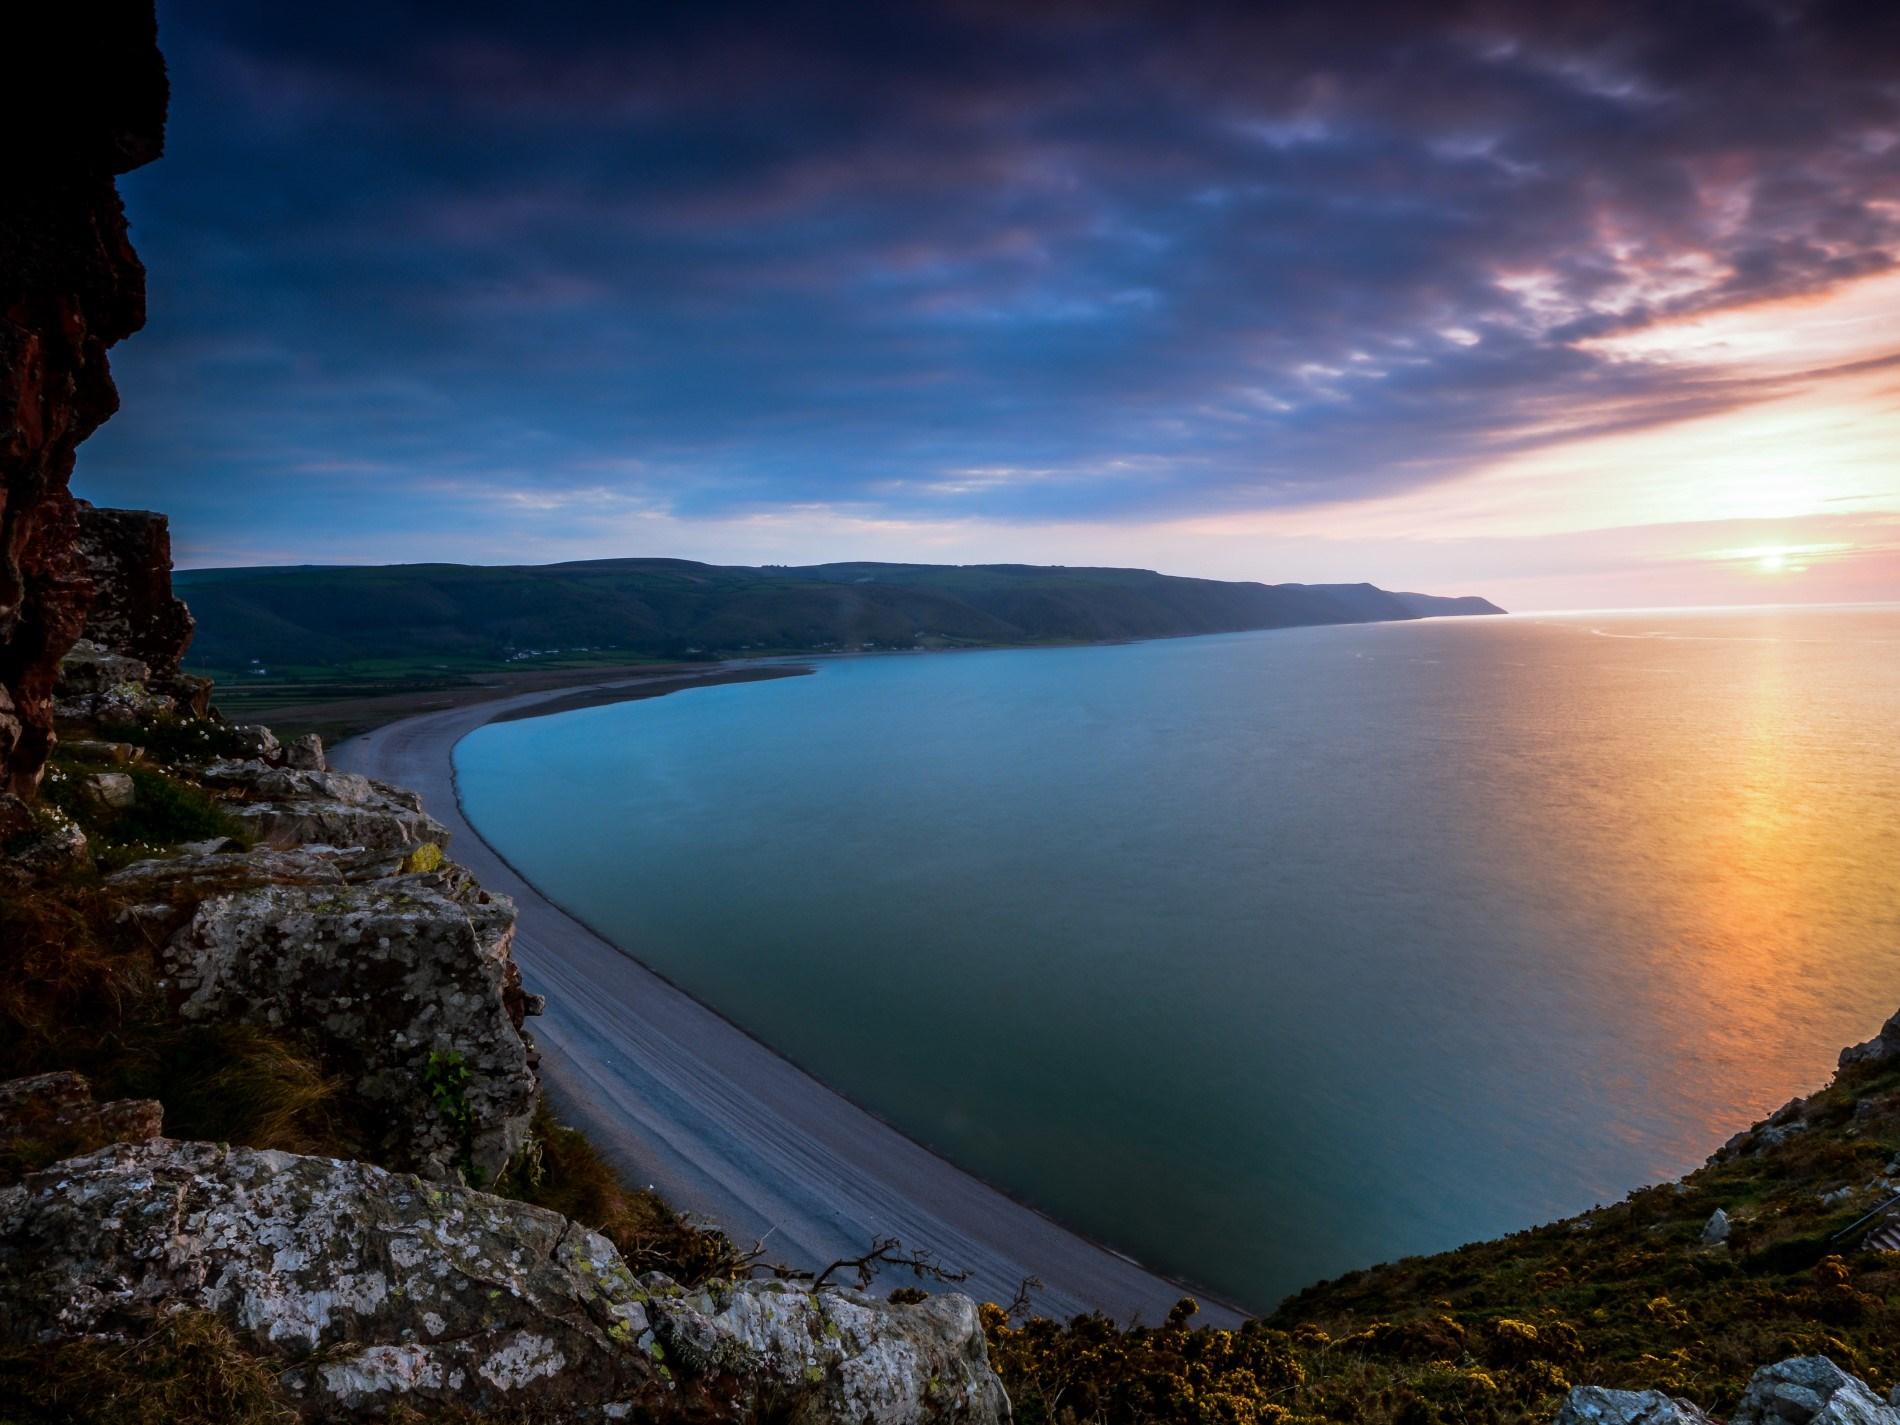 Explore Somersets dramatic coastline just a short walk away